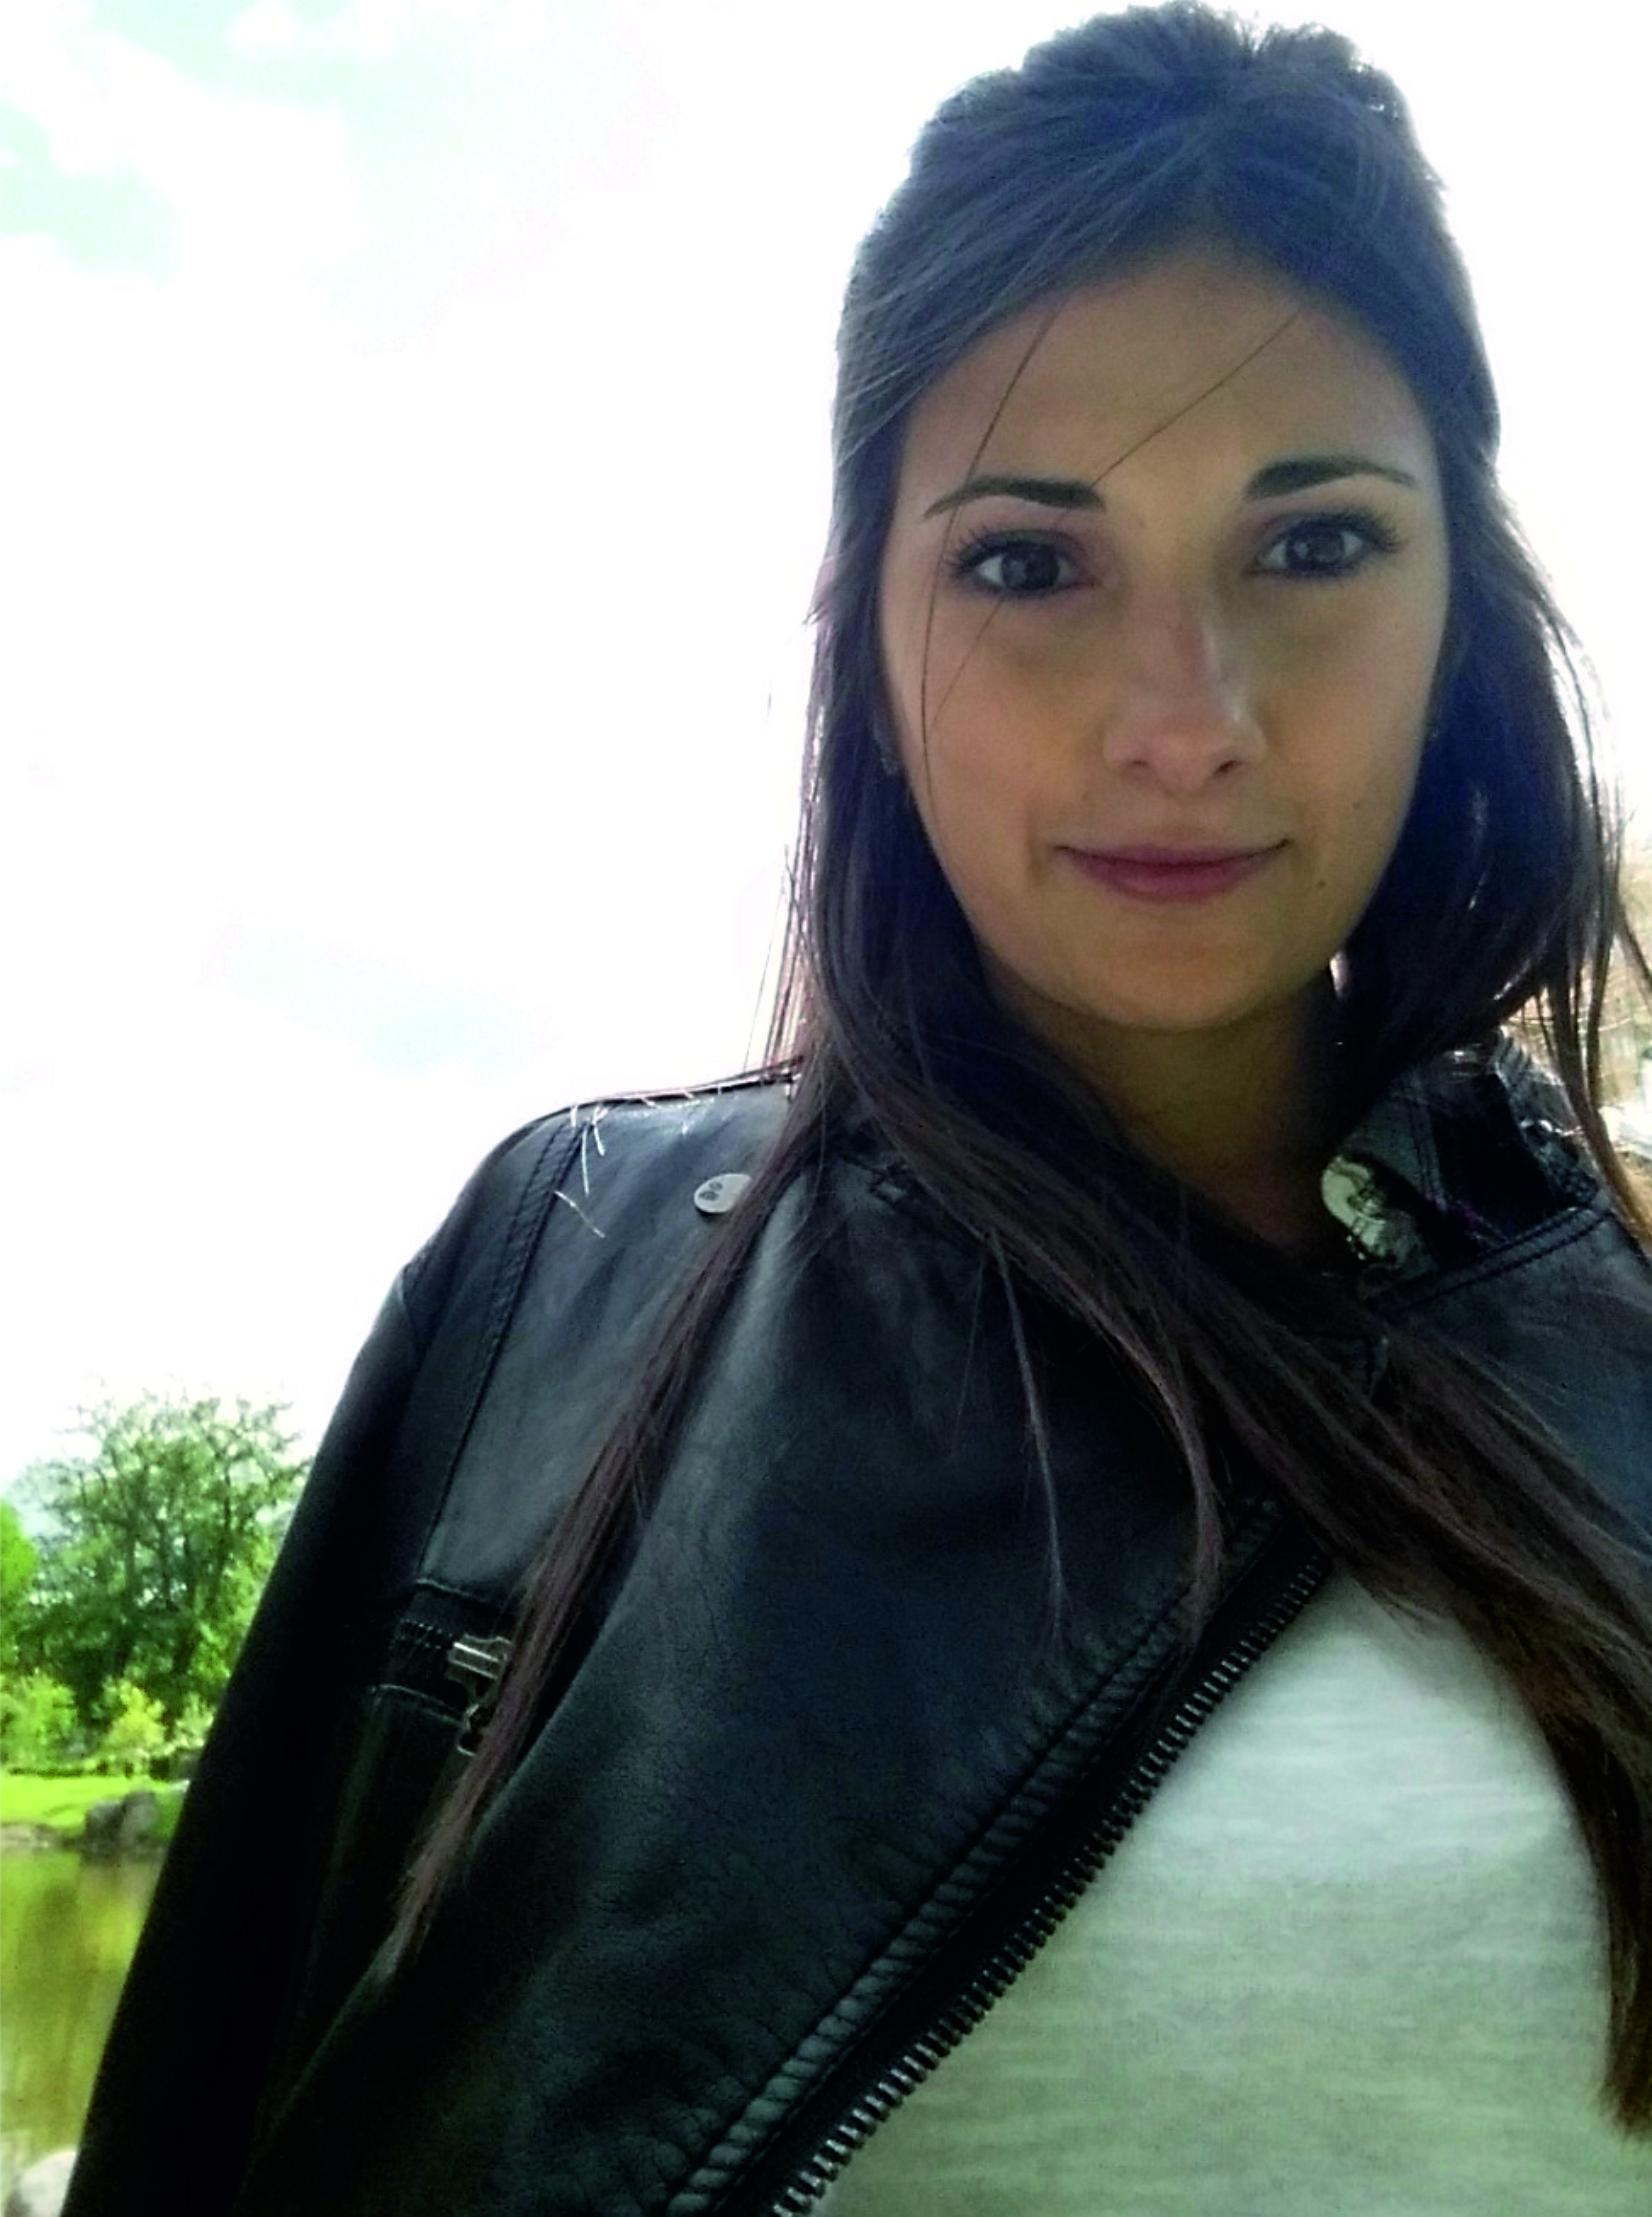 Élita de Caria, fondatrice et créatrice ©Atelier1202